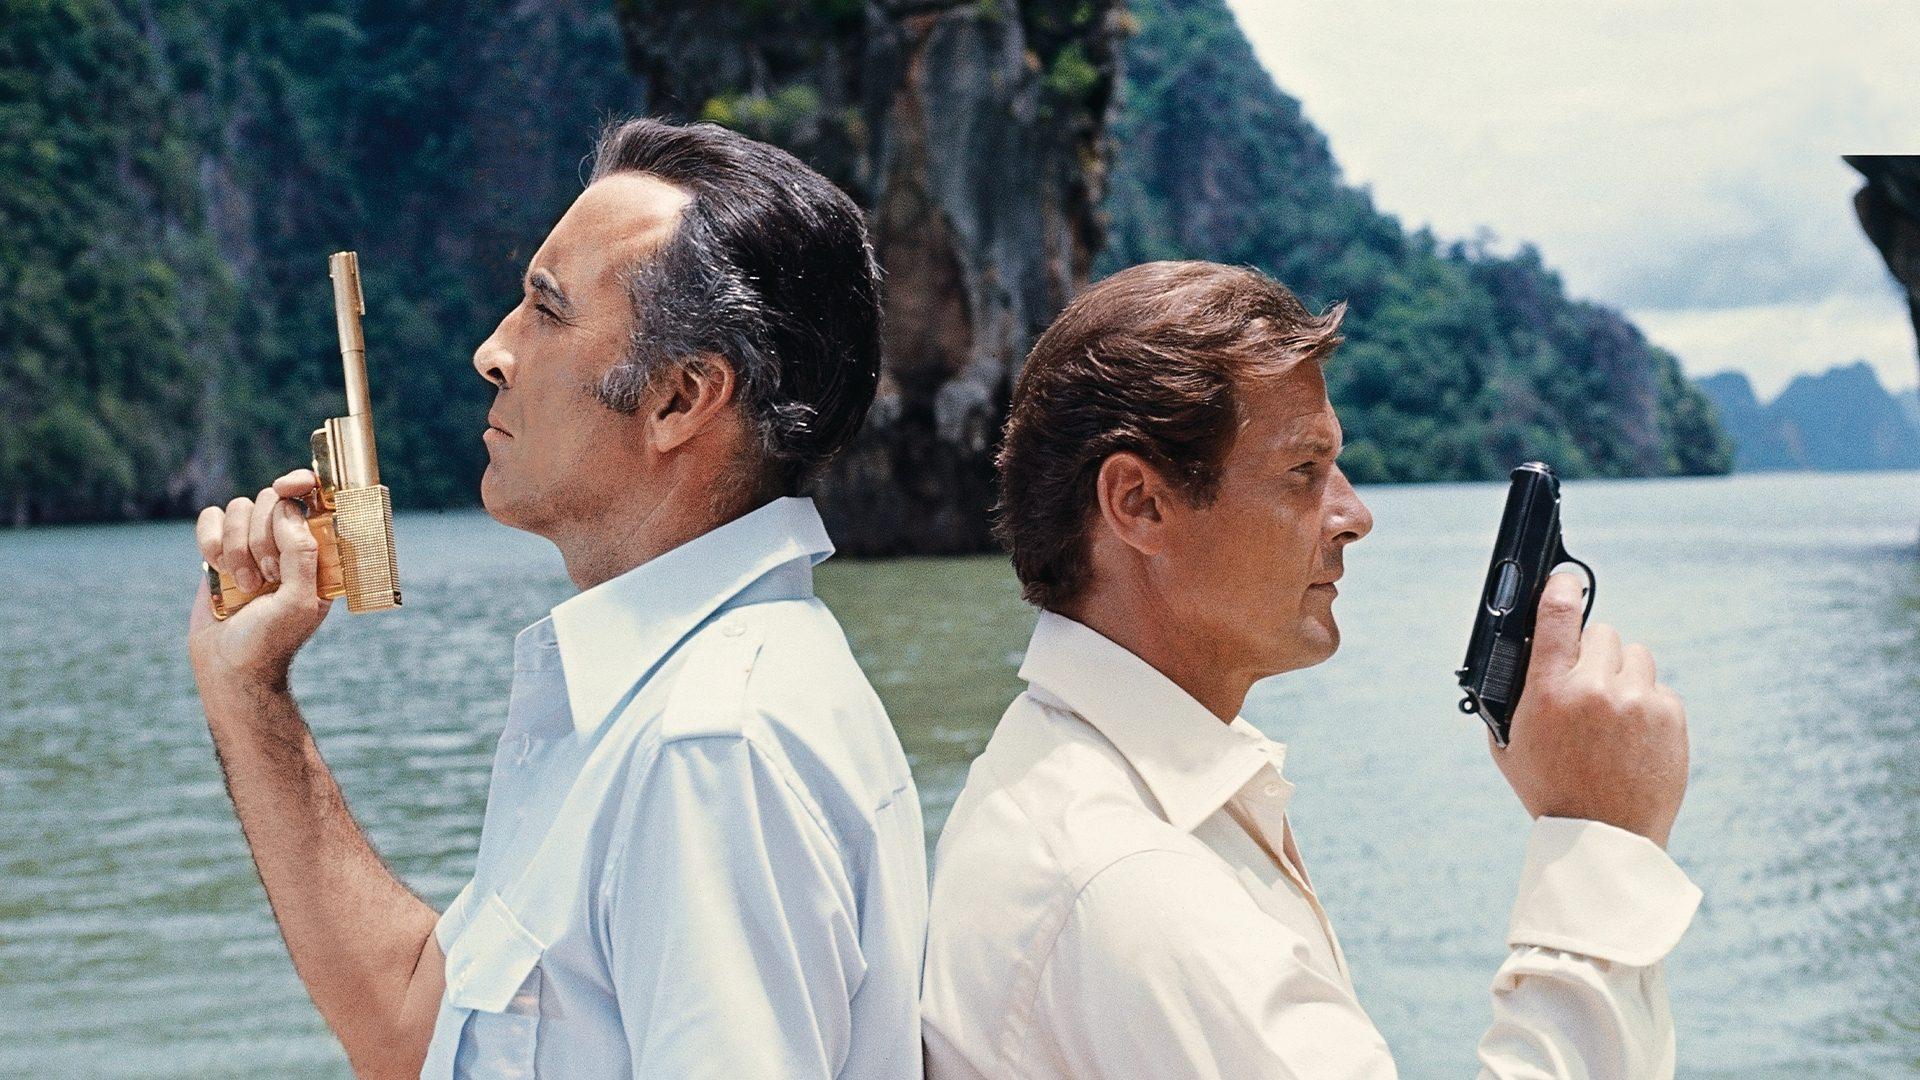 Filmszene aus James Bond 007 - Der Mann mit dem goldenen Colt